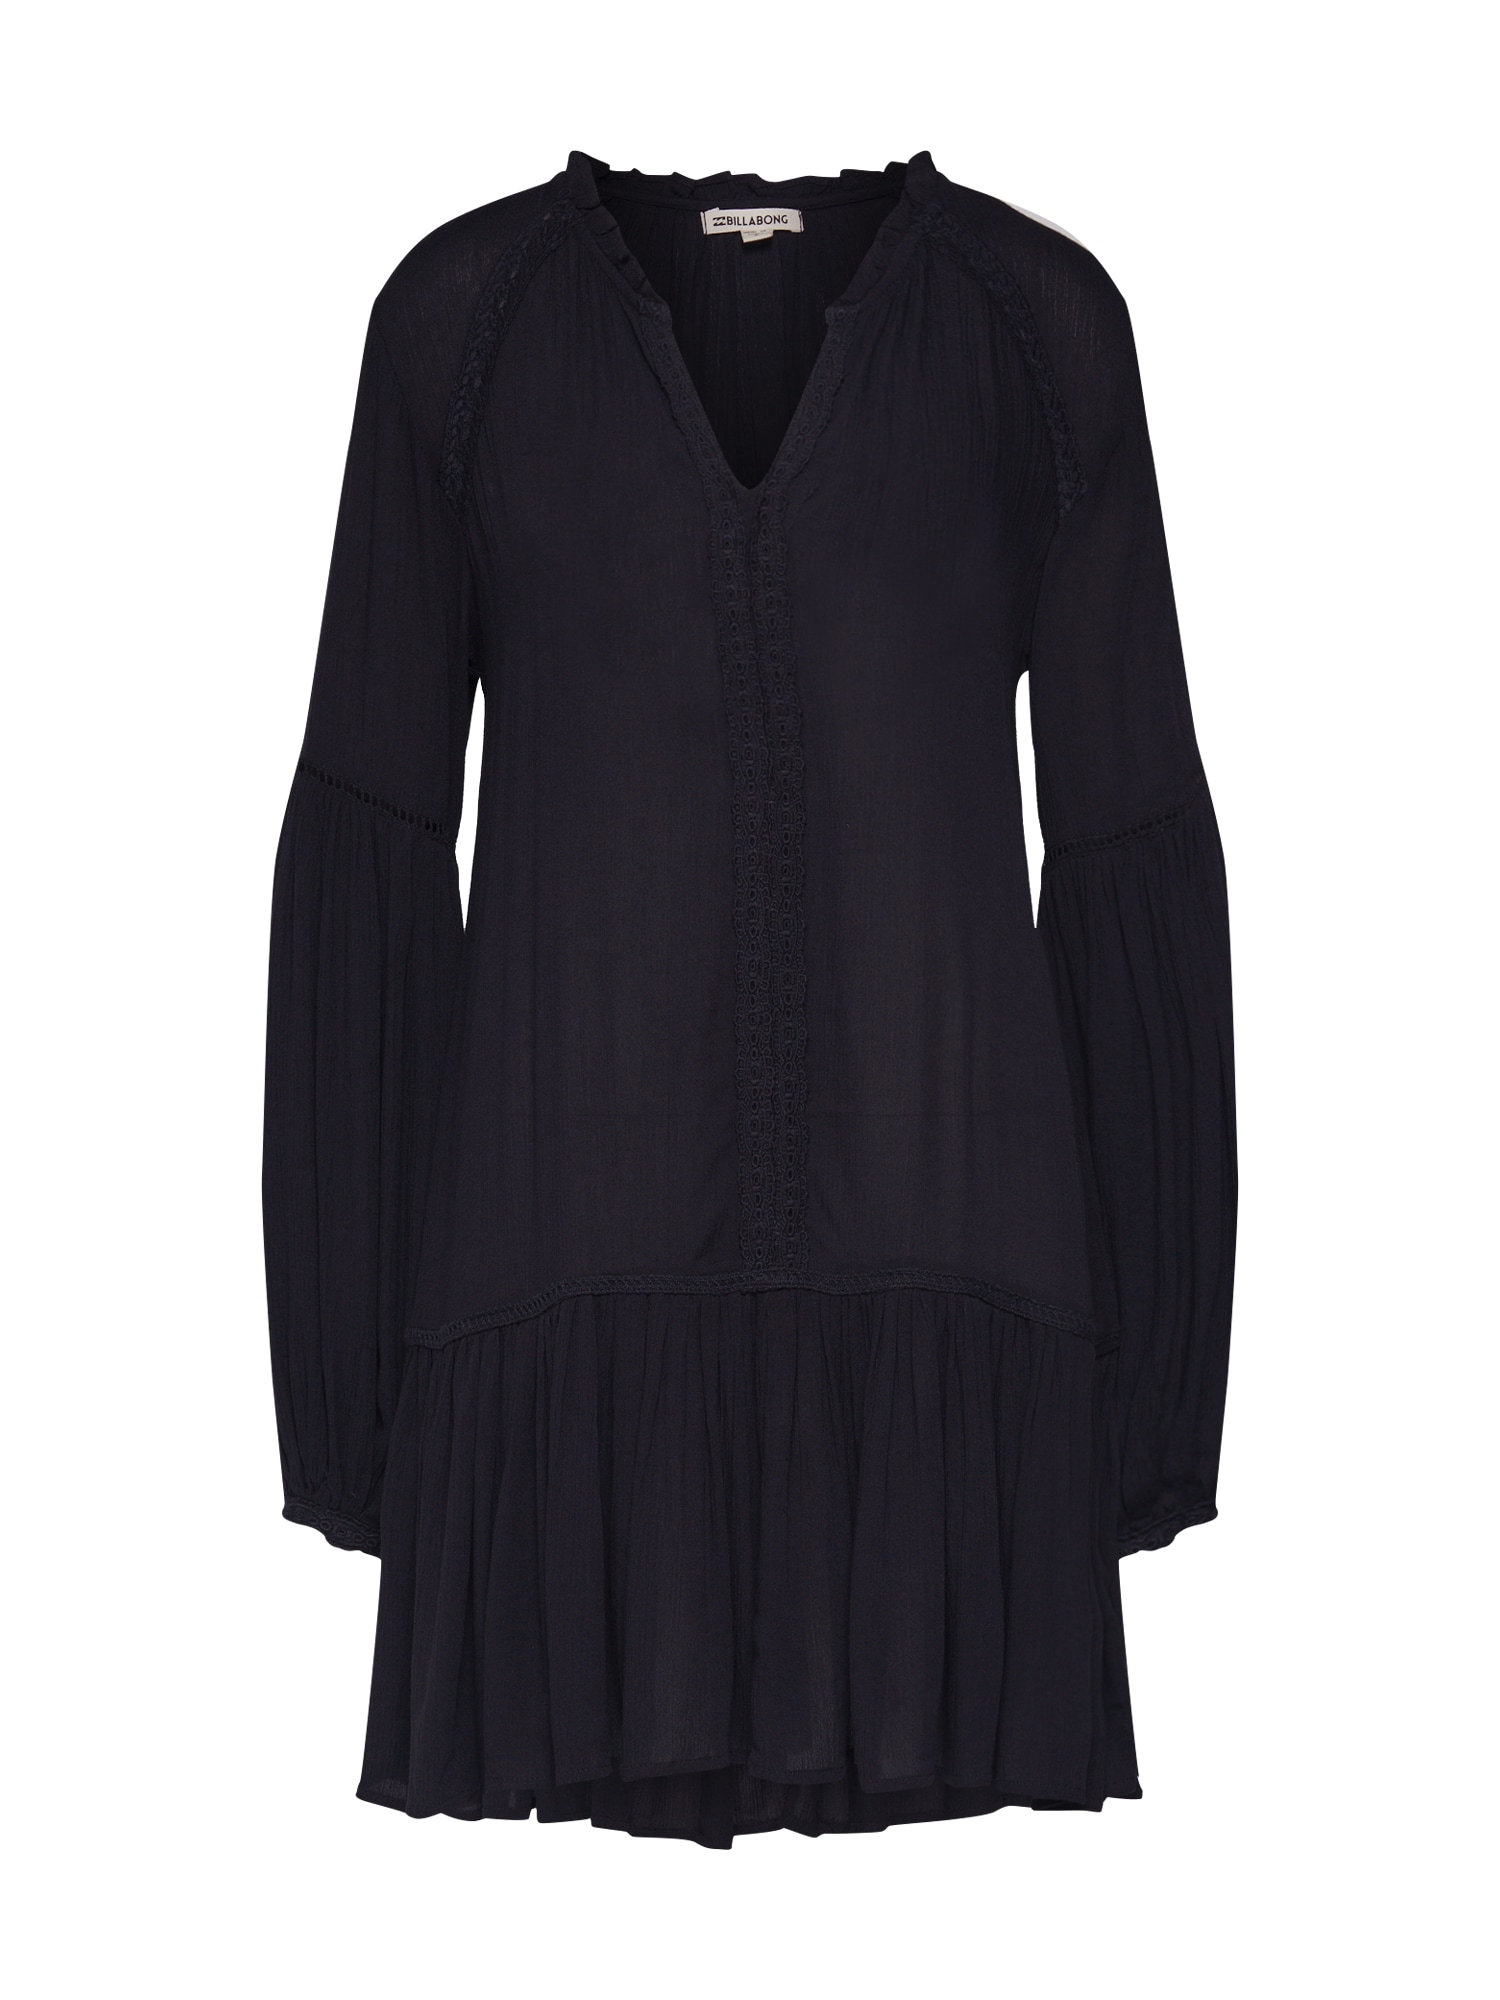 BILLABONG Vasarinė suknelė 'good mood' juoda